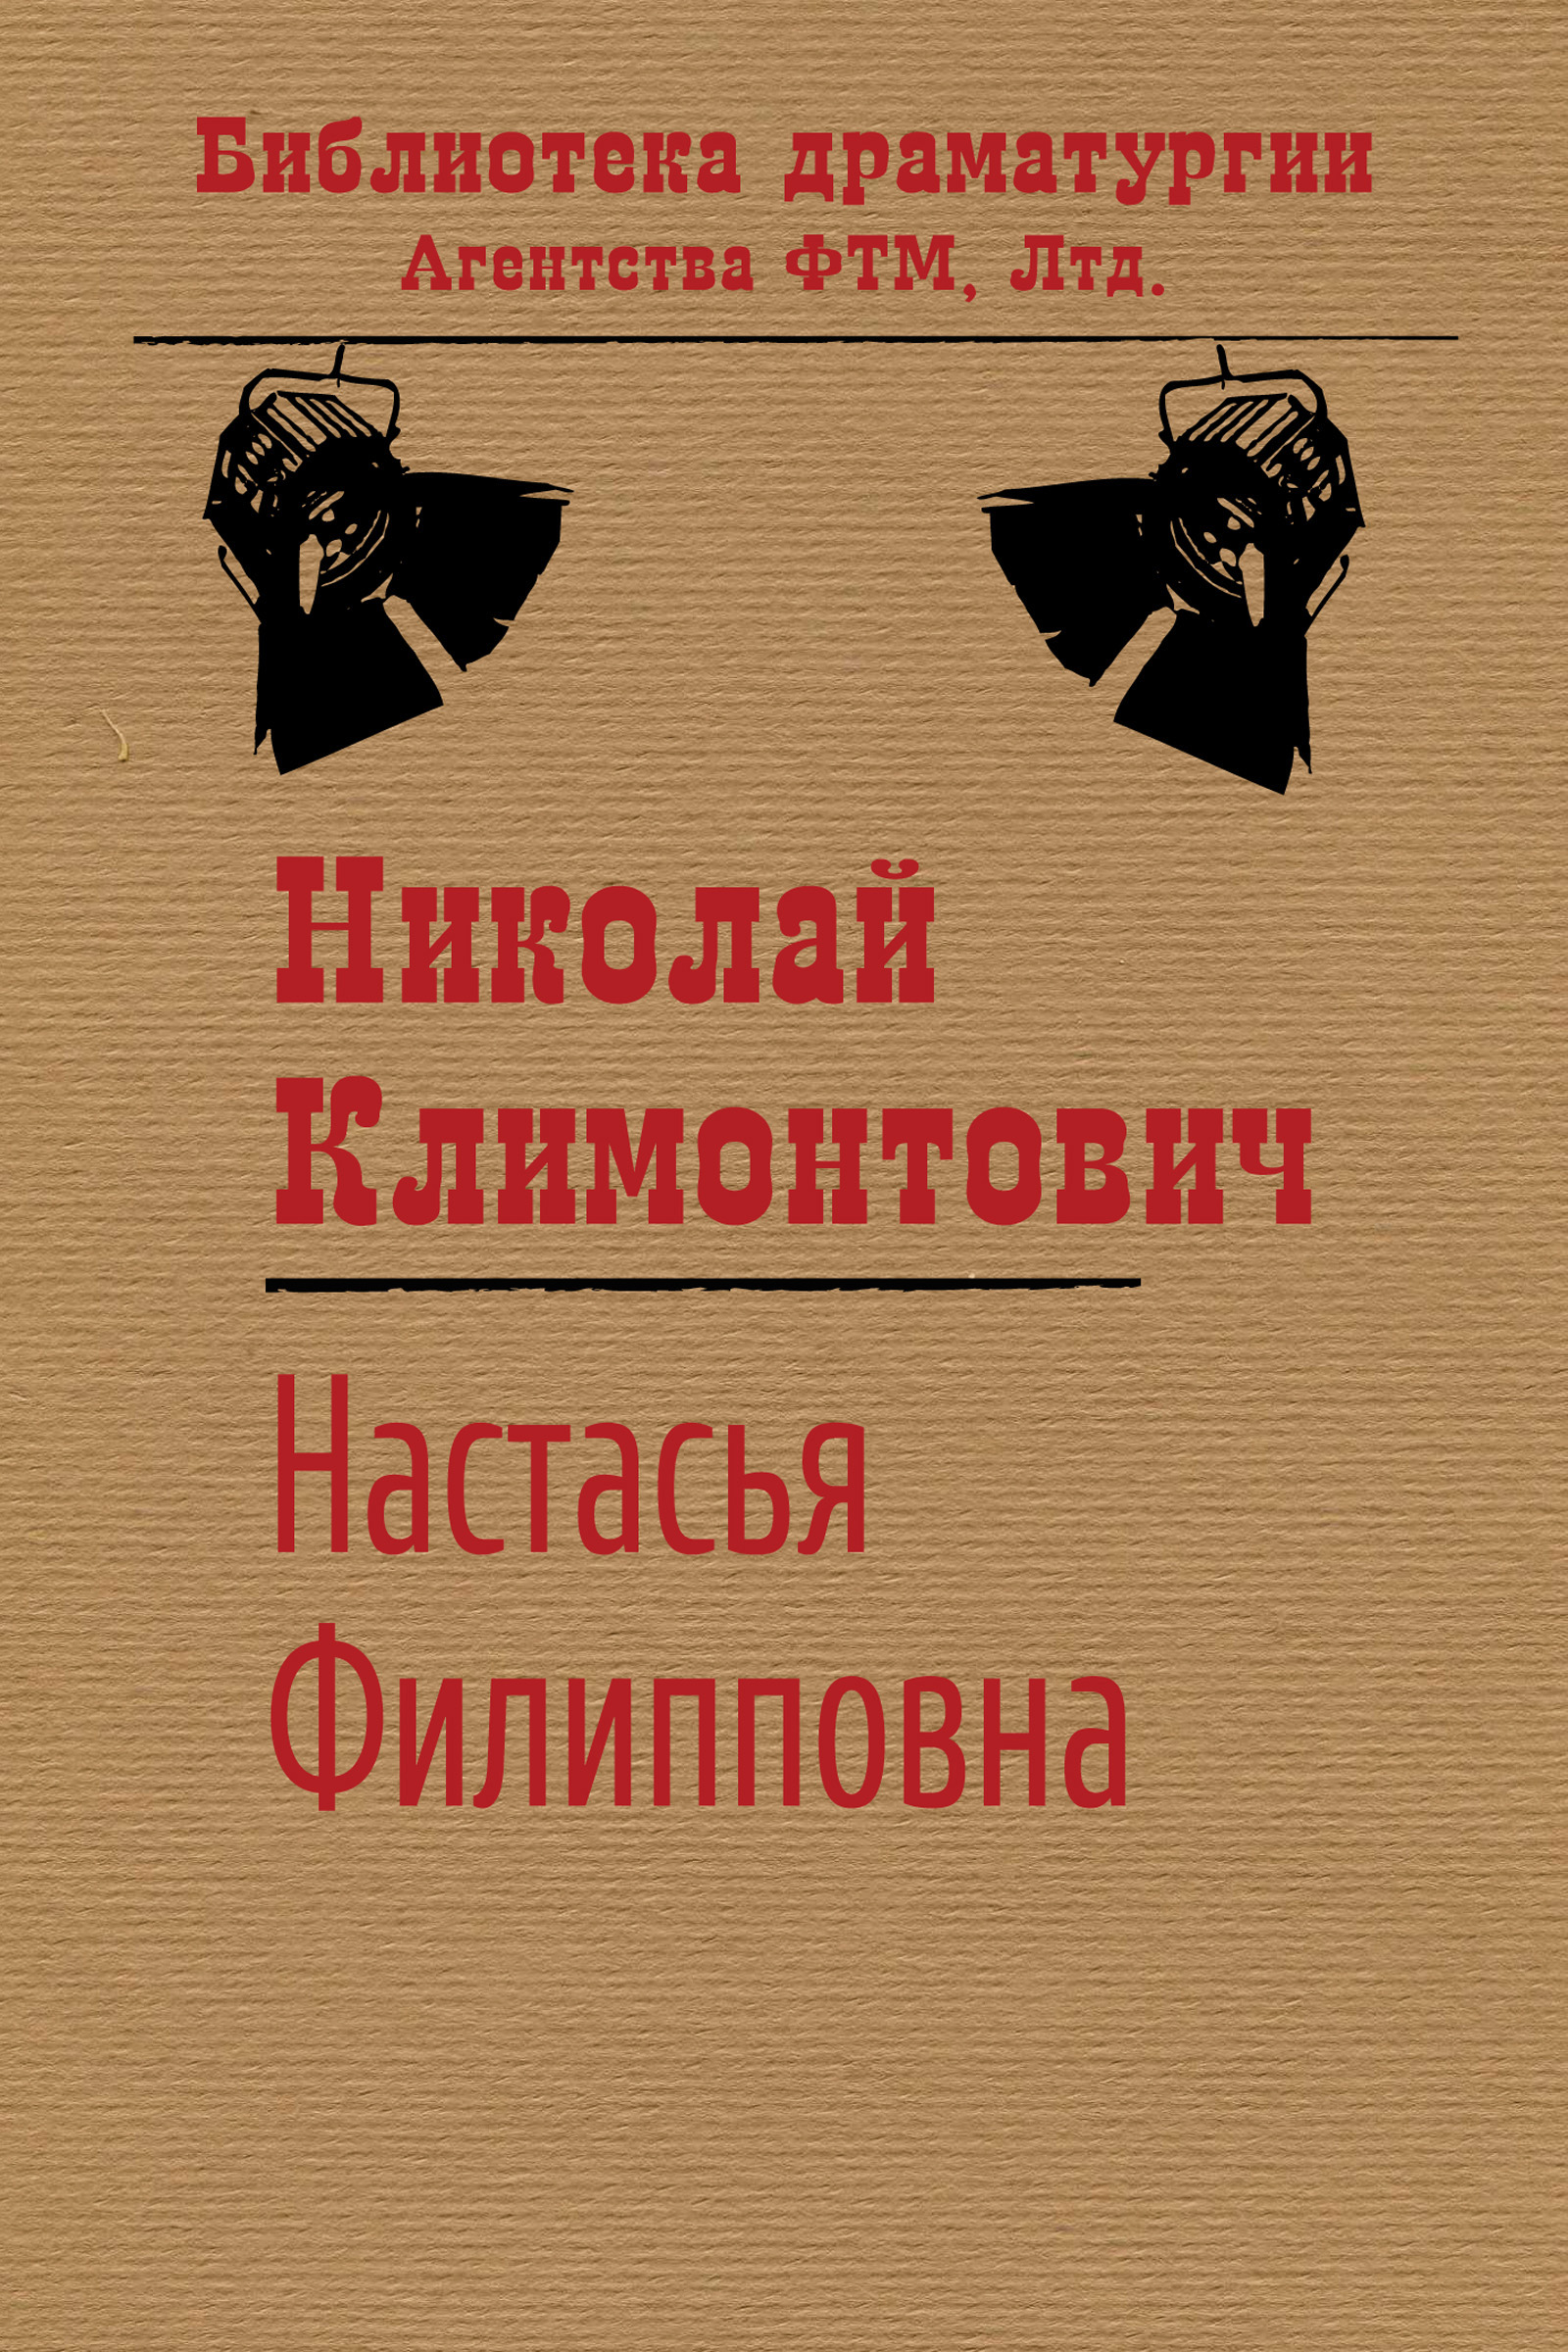 Николай Климонтович Настасья Филипповна